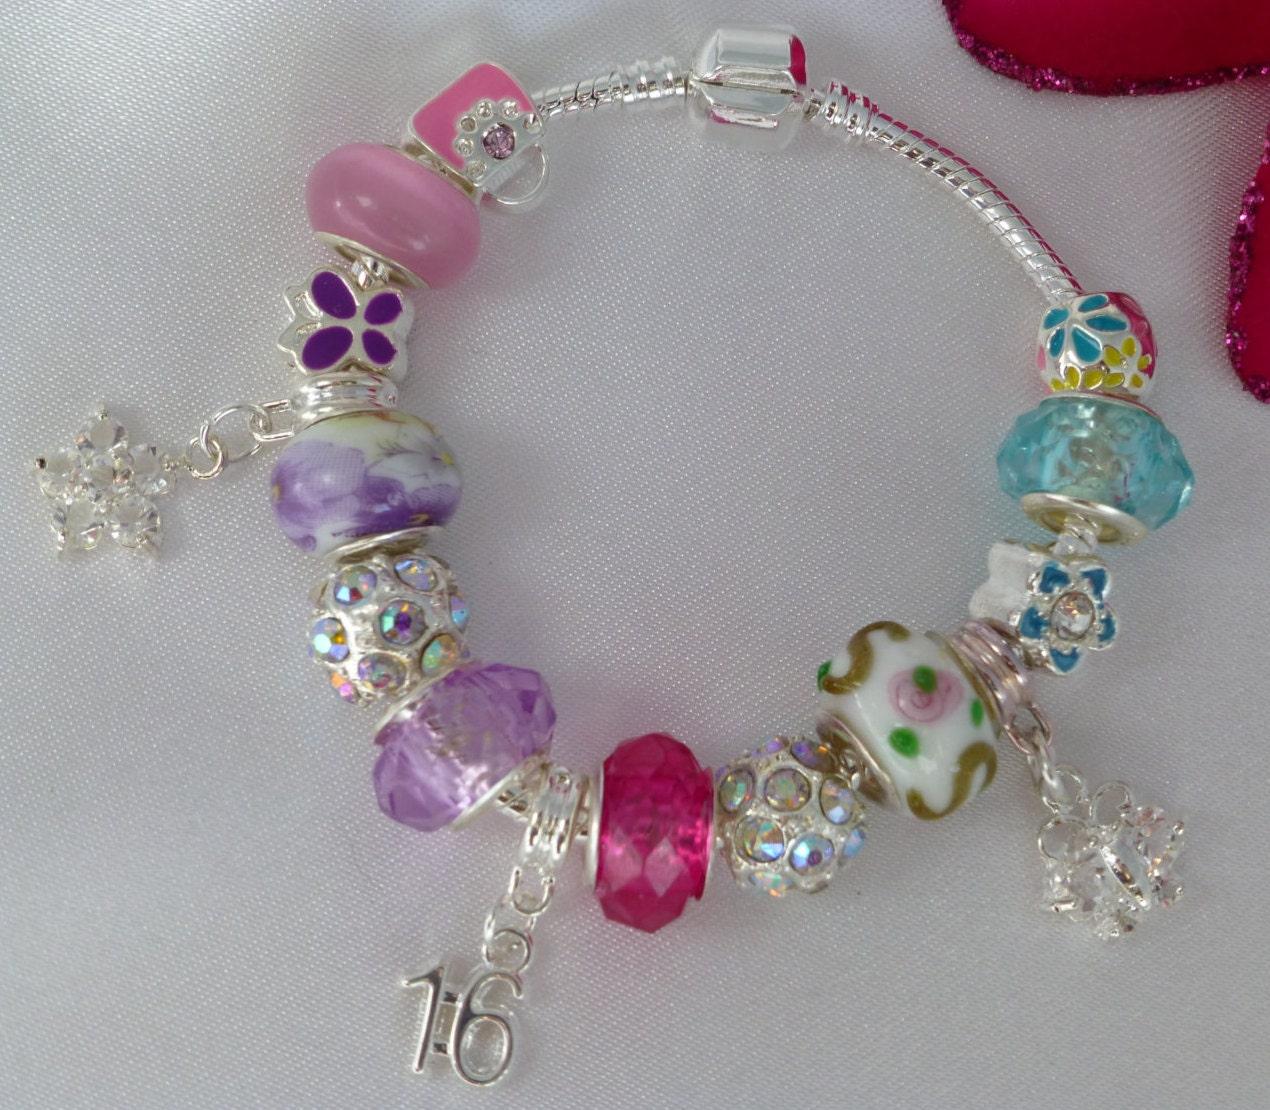 18th Birthday Heart Initial Bracelet 18th Birthday Jewelry: Charm Bracelet 16th Birthday 18th Or 21st Charm In By